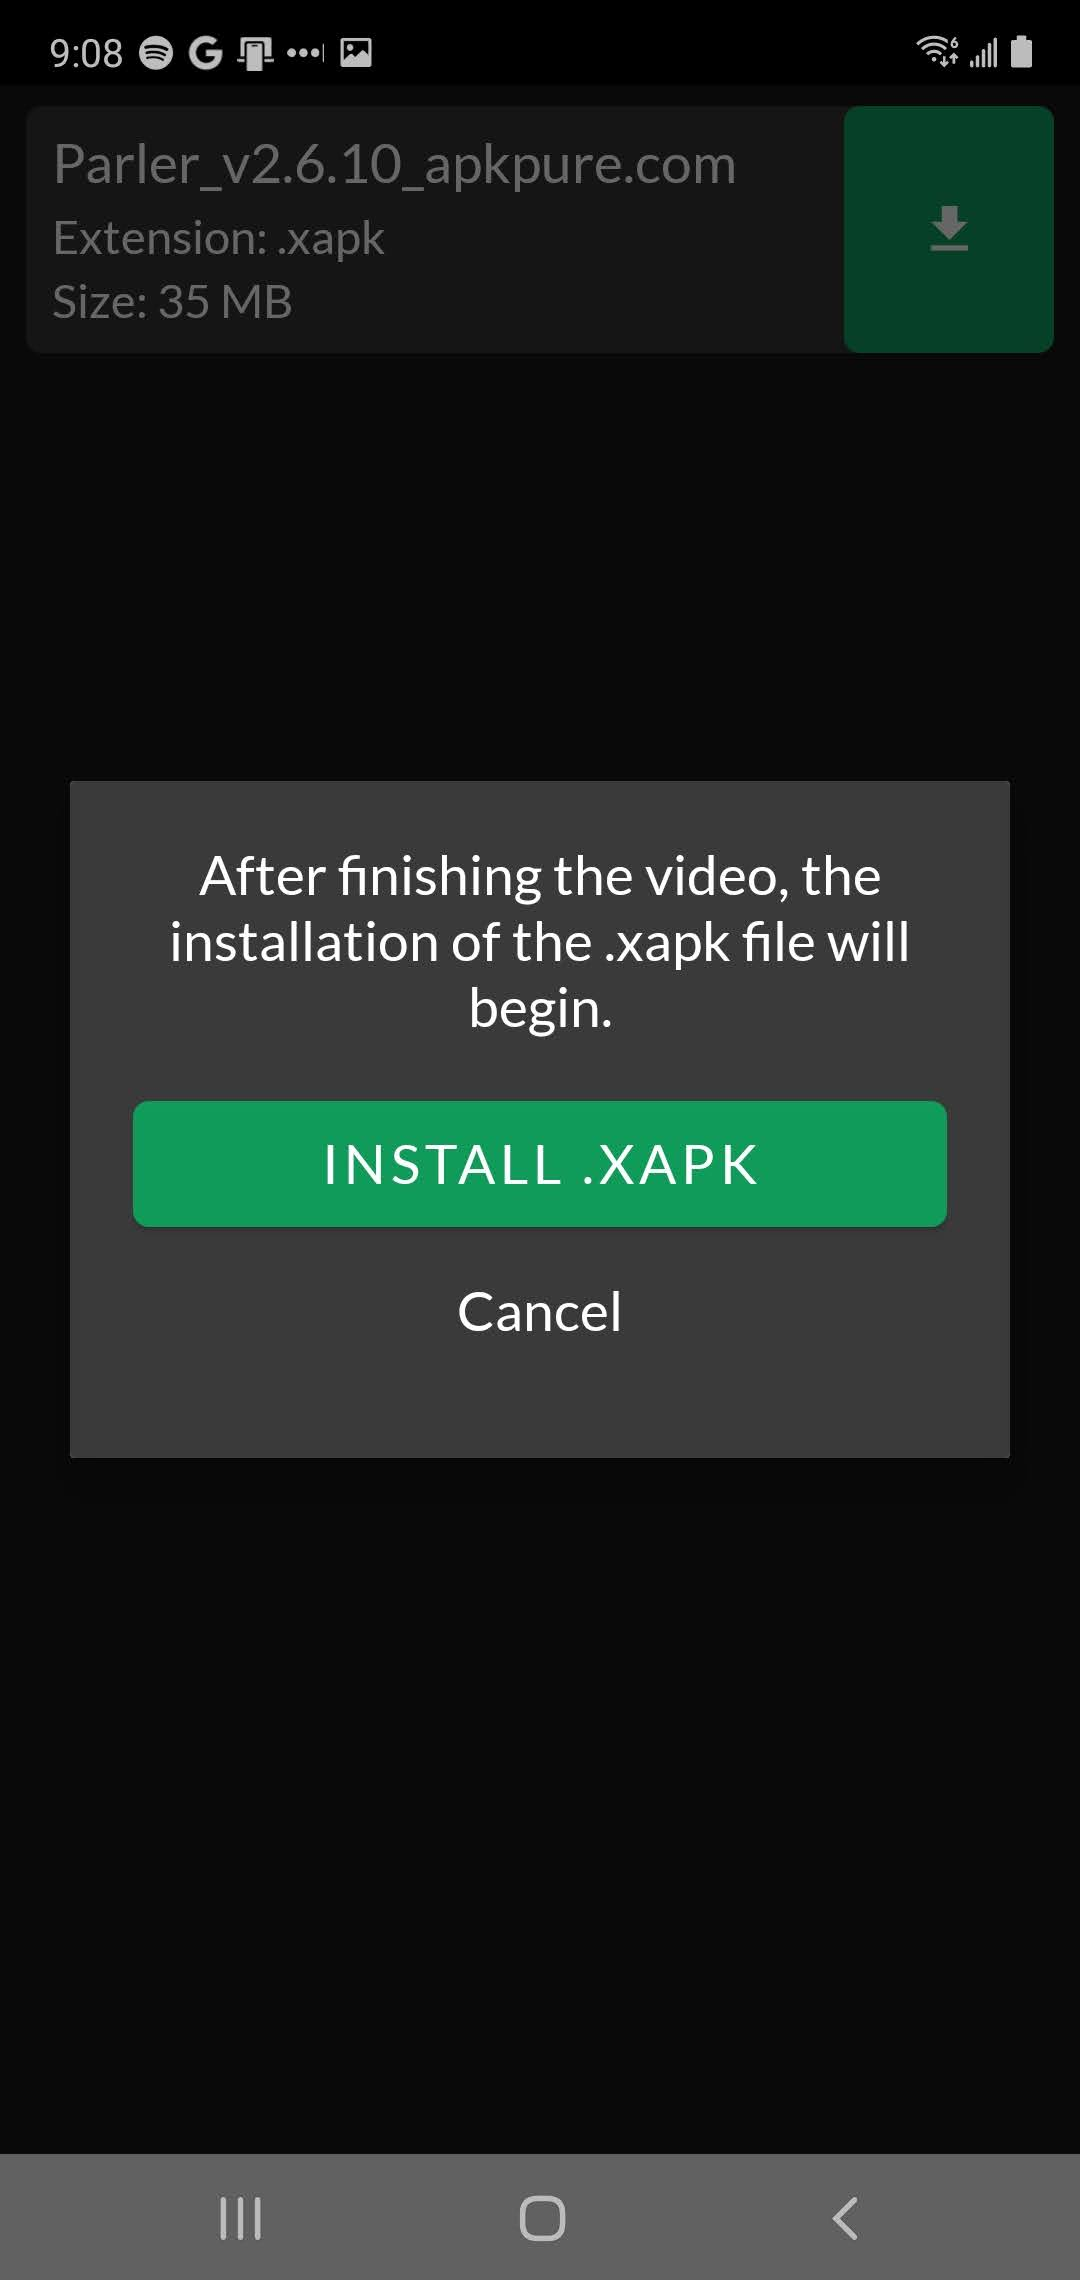 install parler XAPK